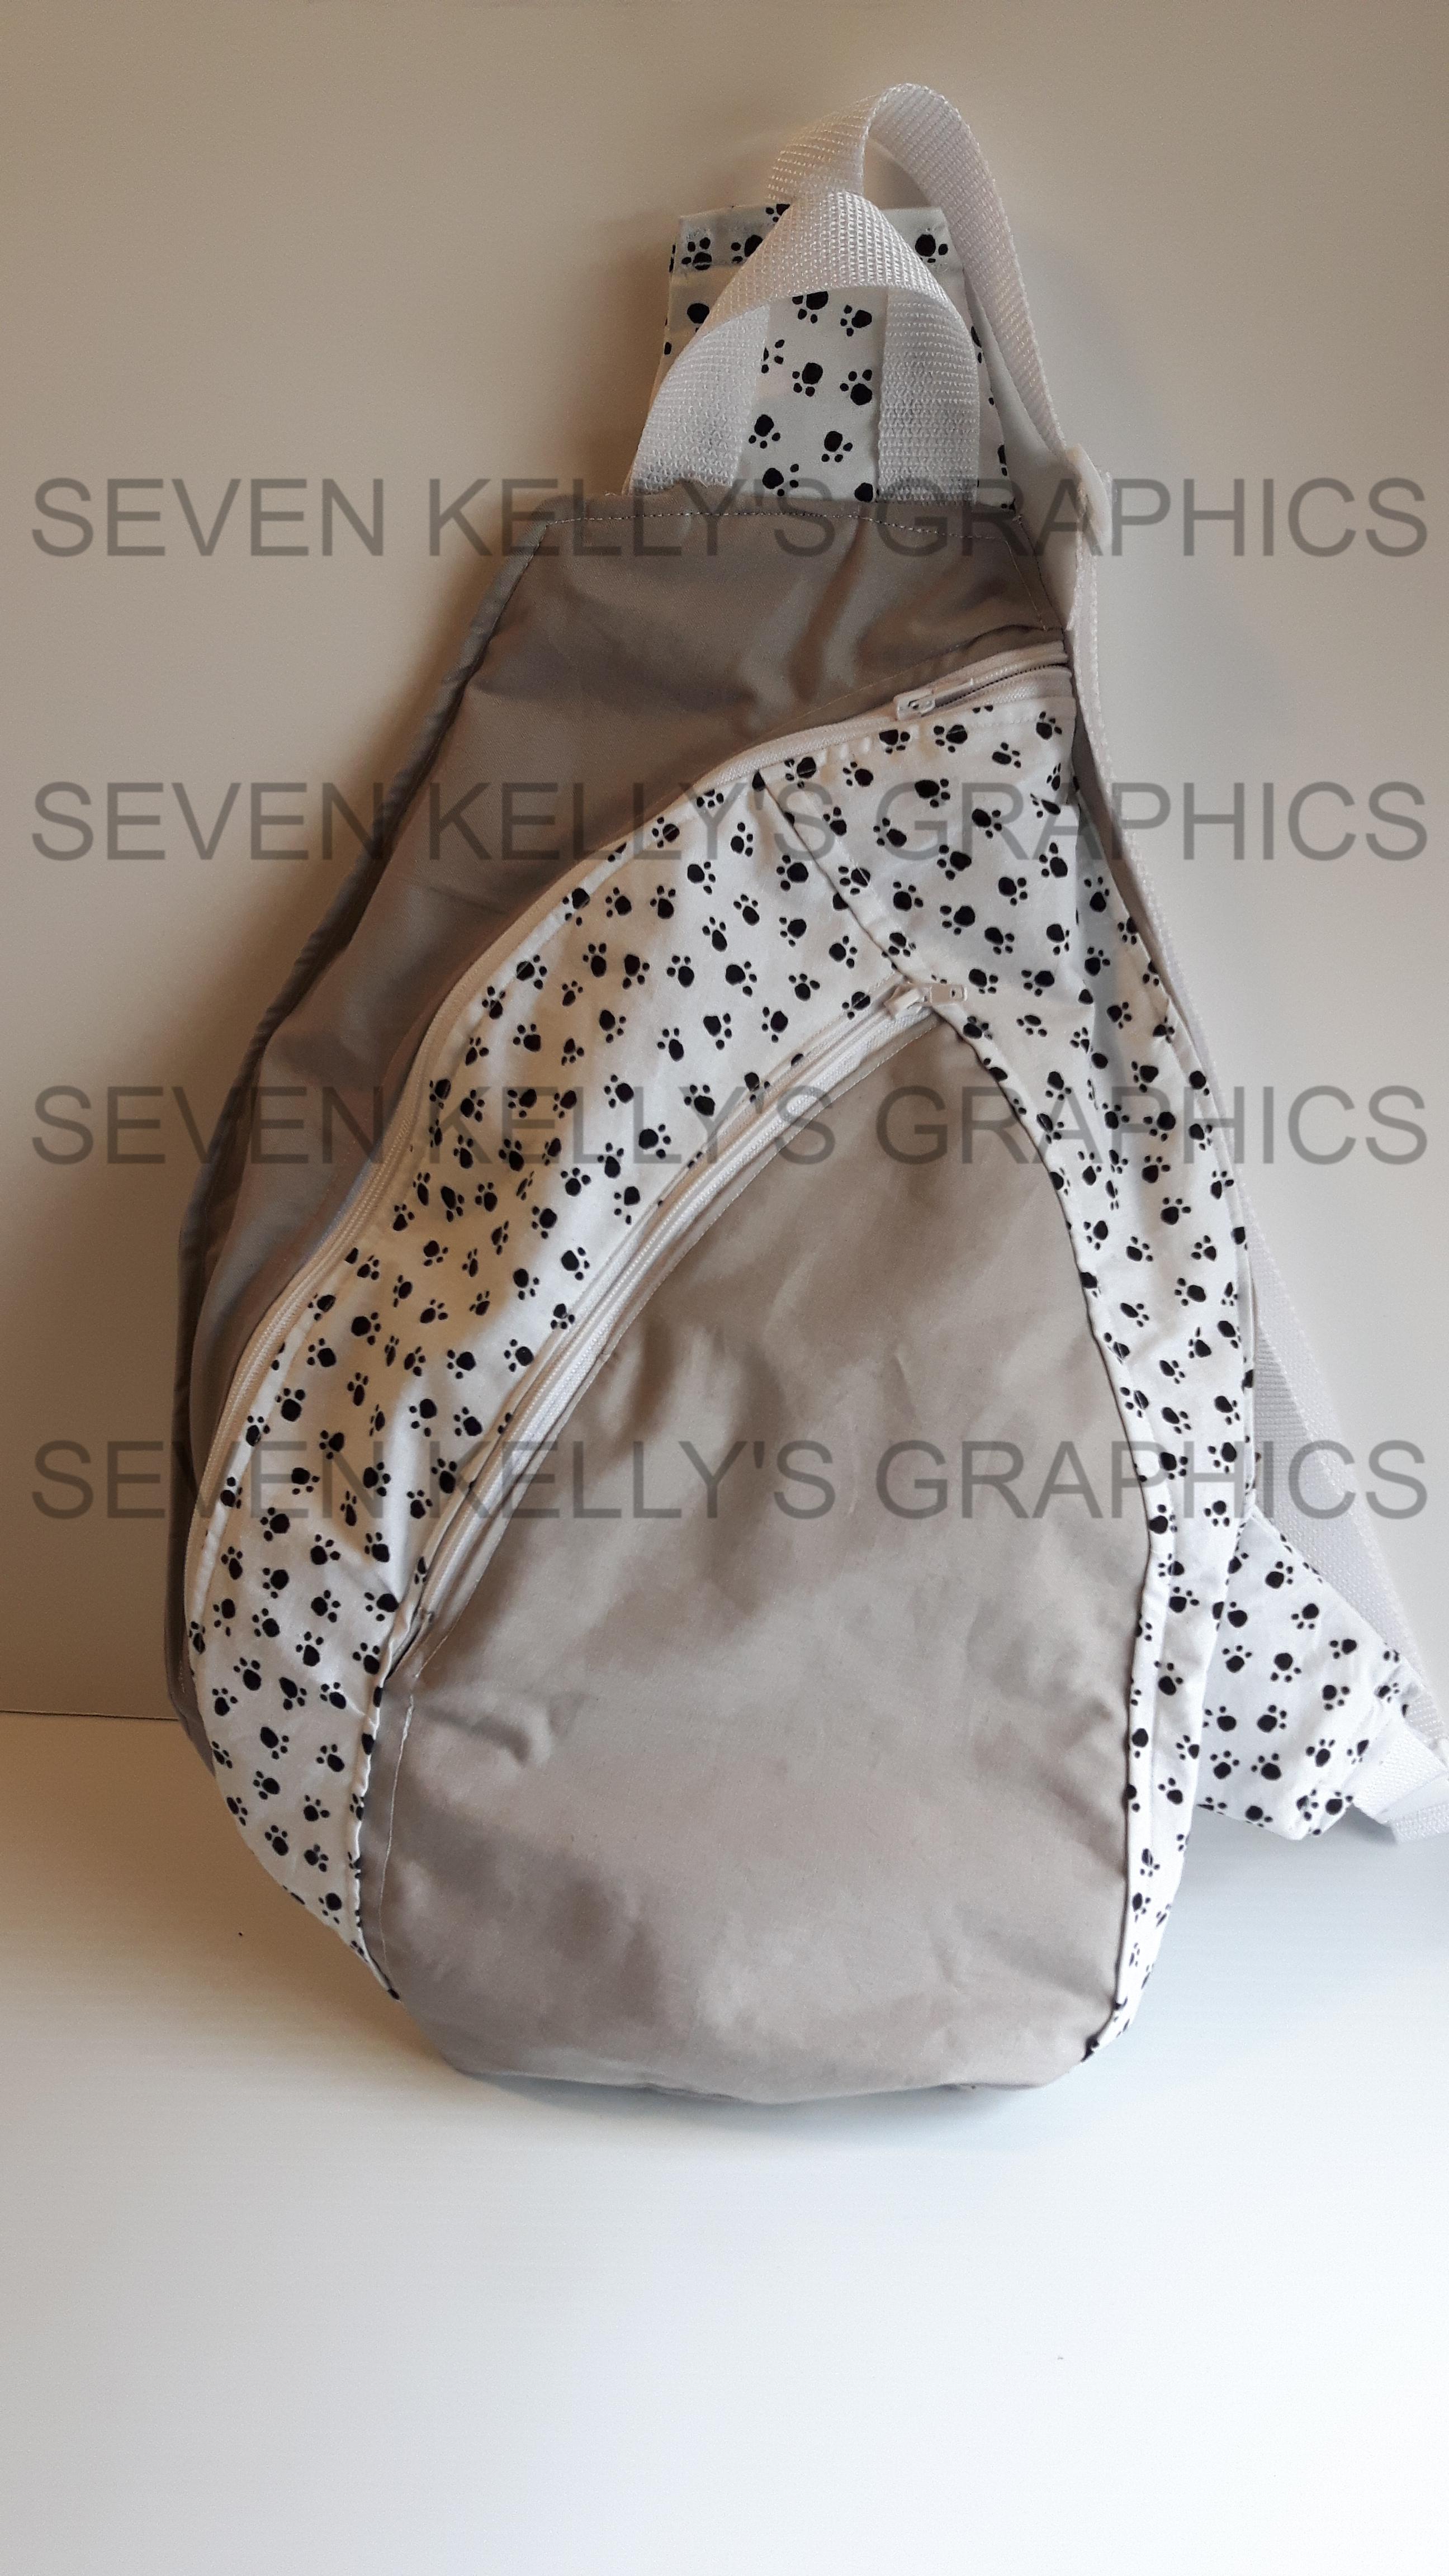 Greypawprints6